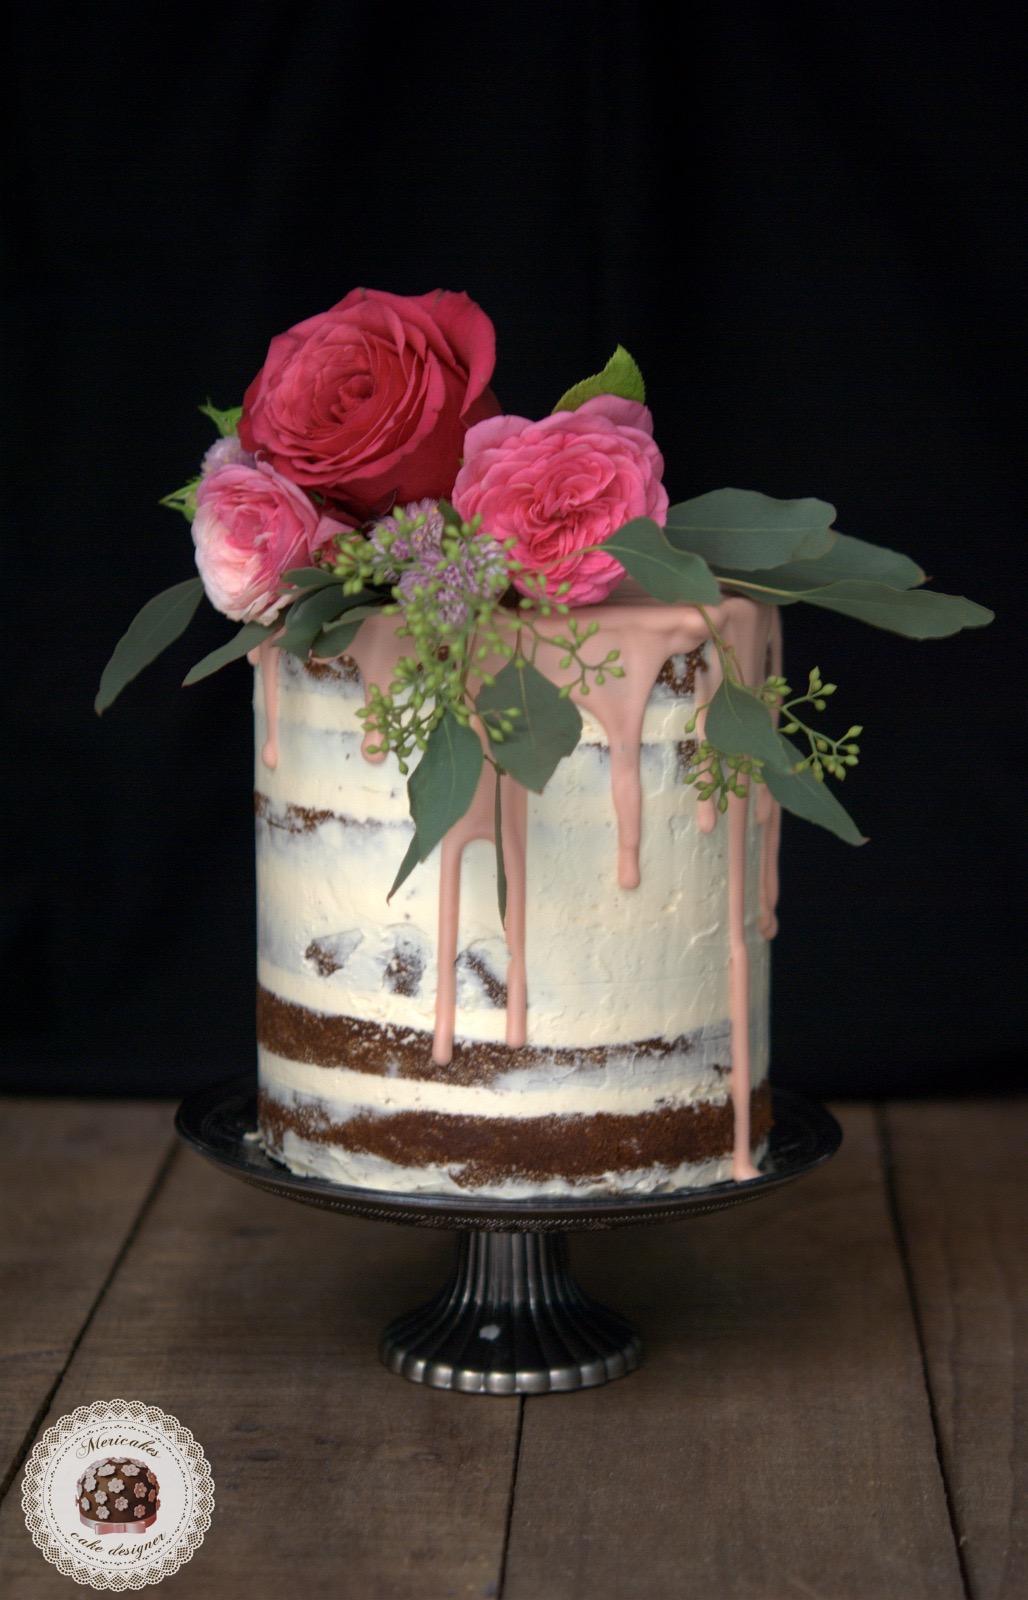 mericakes-naked-cake-fresh-flowers-layr-cake-tarta-pastel-barcelona-tarta-cumpleanos-celebraciones-eventos-event-planner-roses-almond-cake